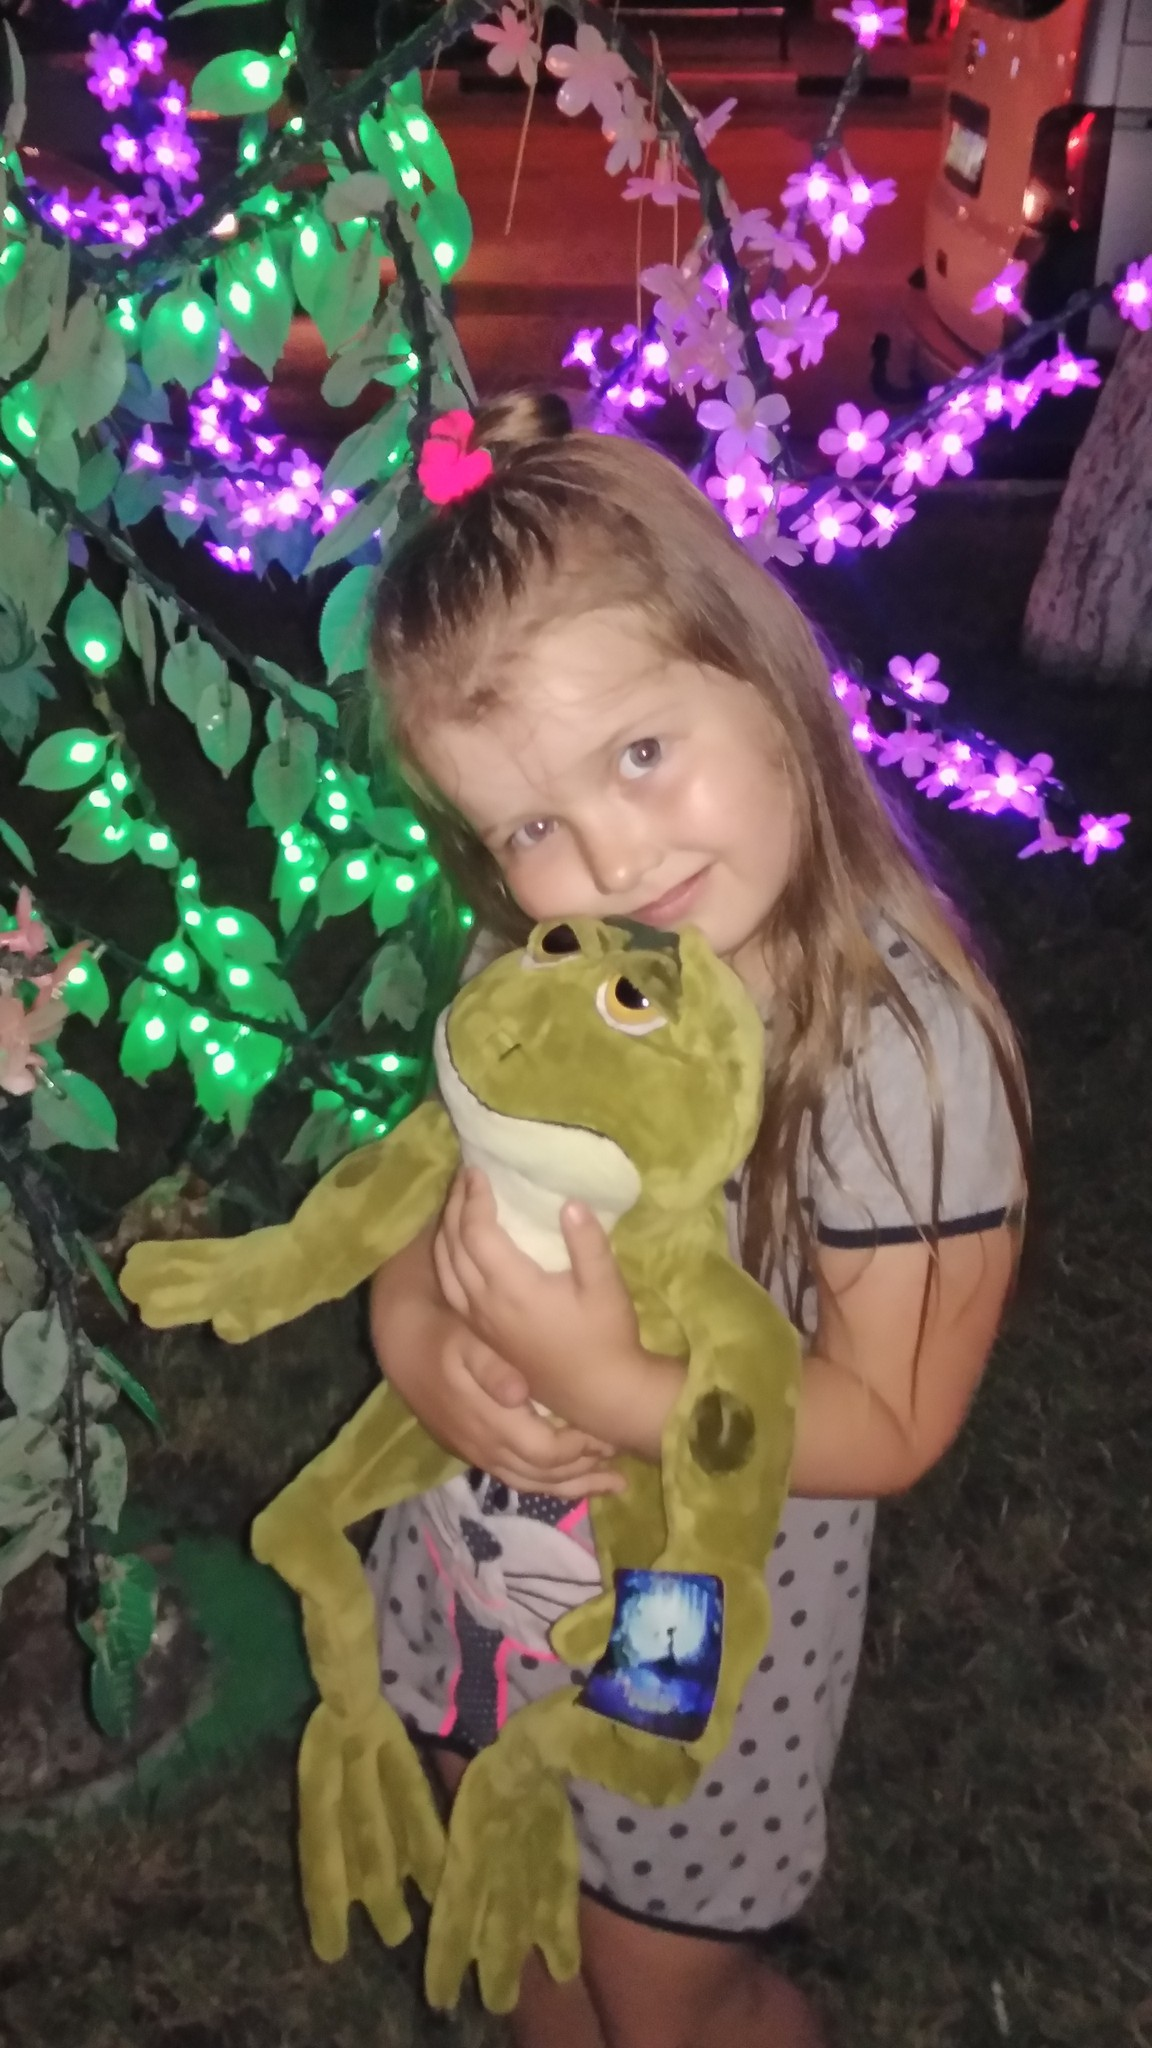 Астраханцева Полина, 5 лет